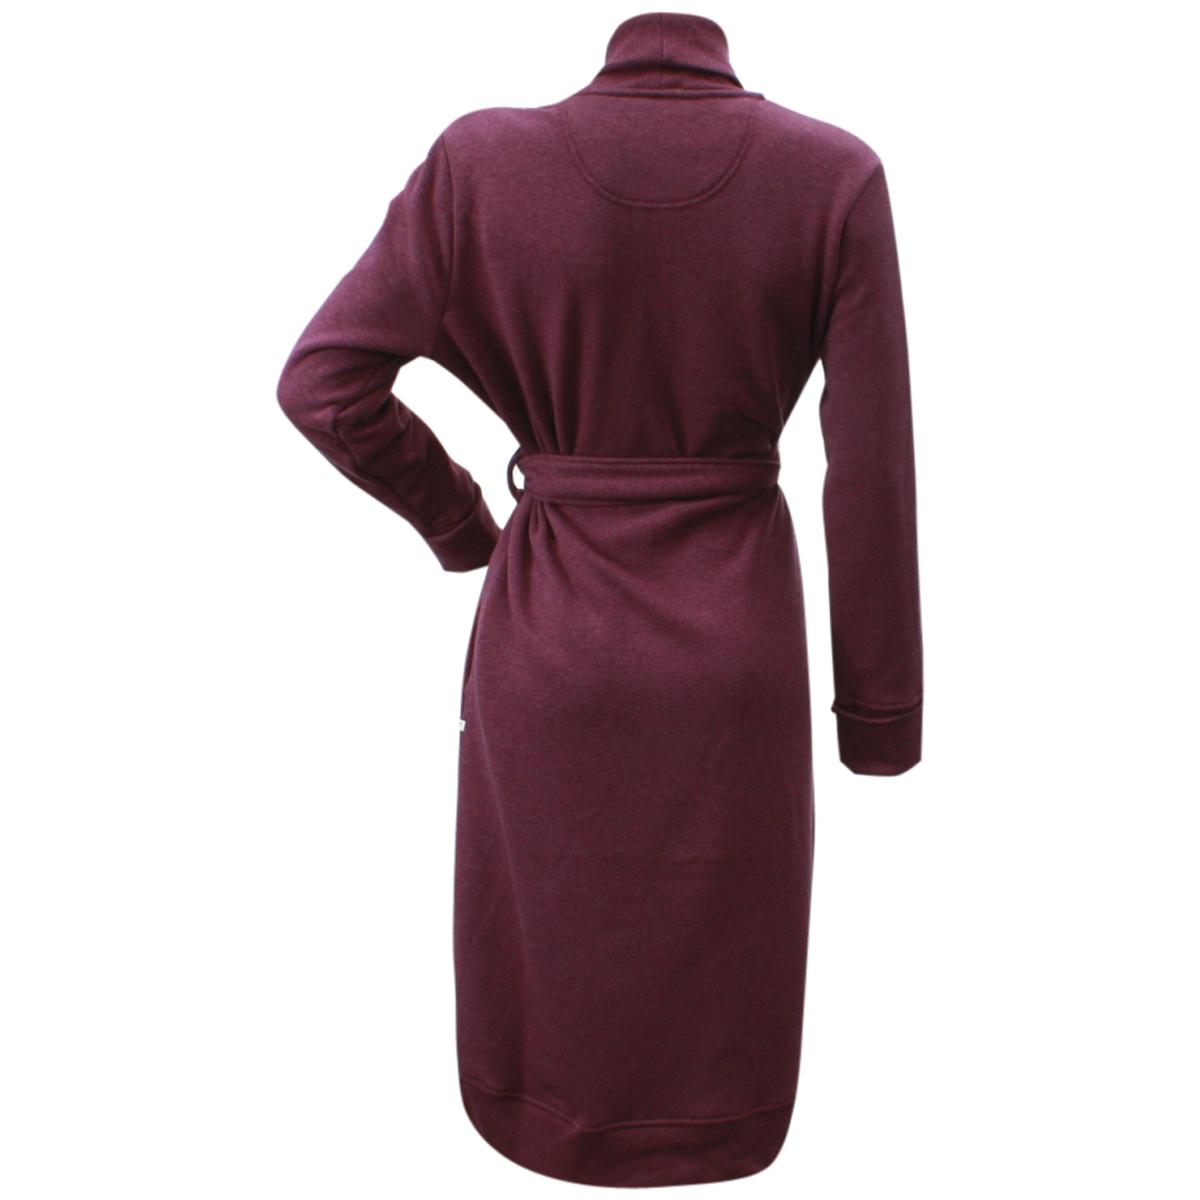 69fc4436fc Ugg Women s Karoline Shawl Collar Robe